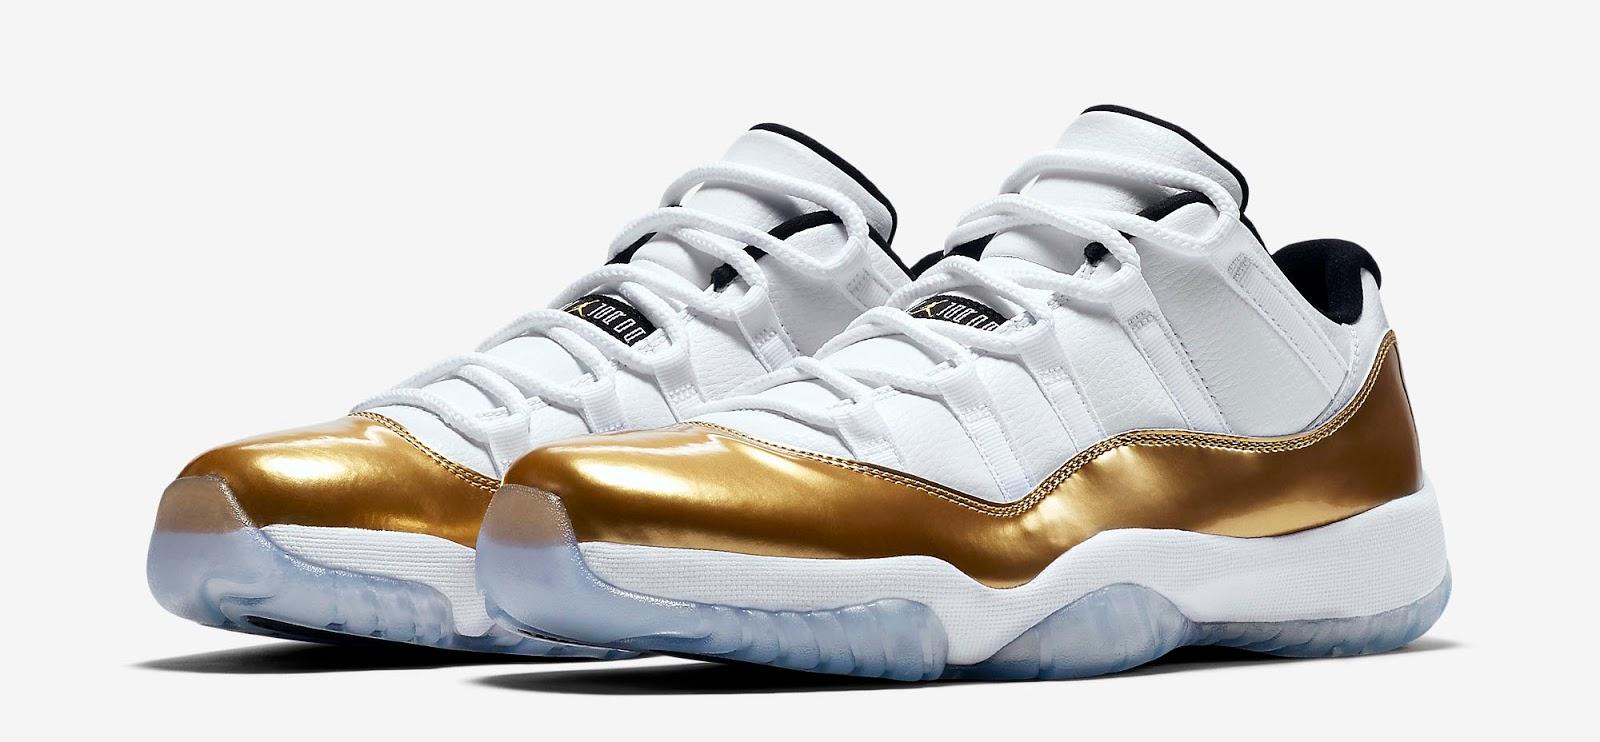 online retailer 13e4b 6d032 ajordanxi Your  1 Source For Sneaker Release Dates  Air Jordan 11 Retro Low